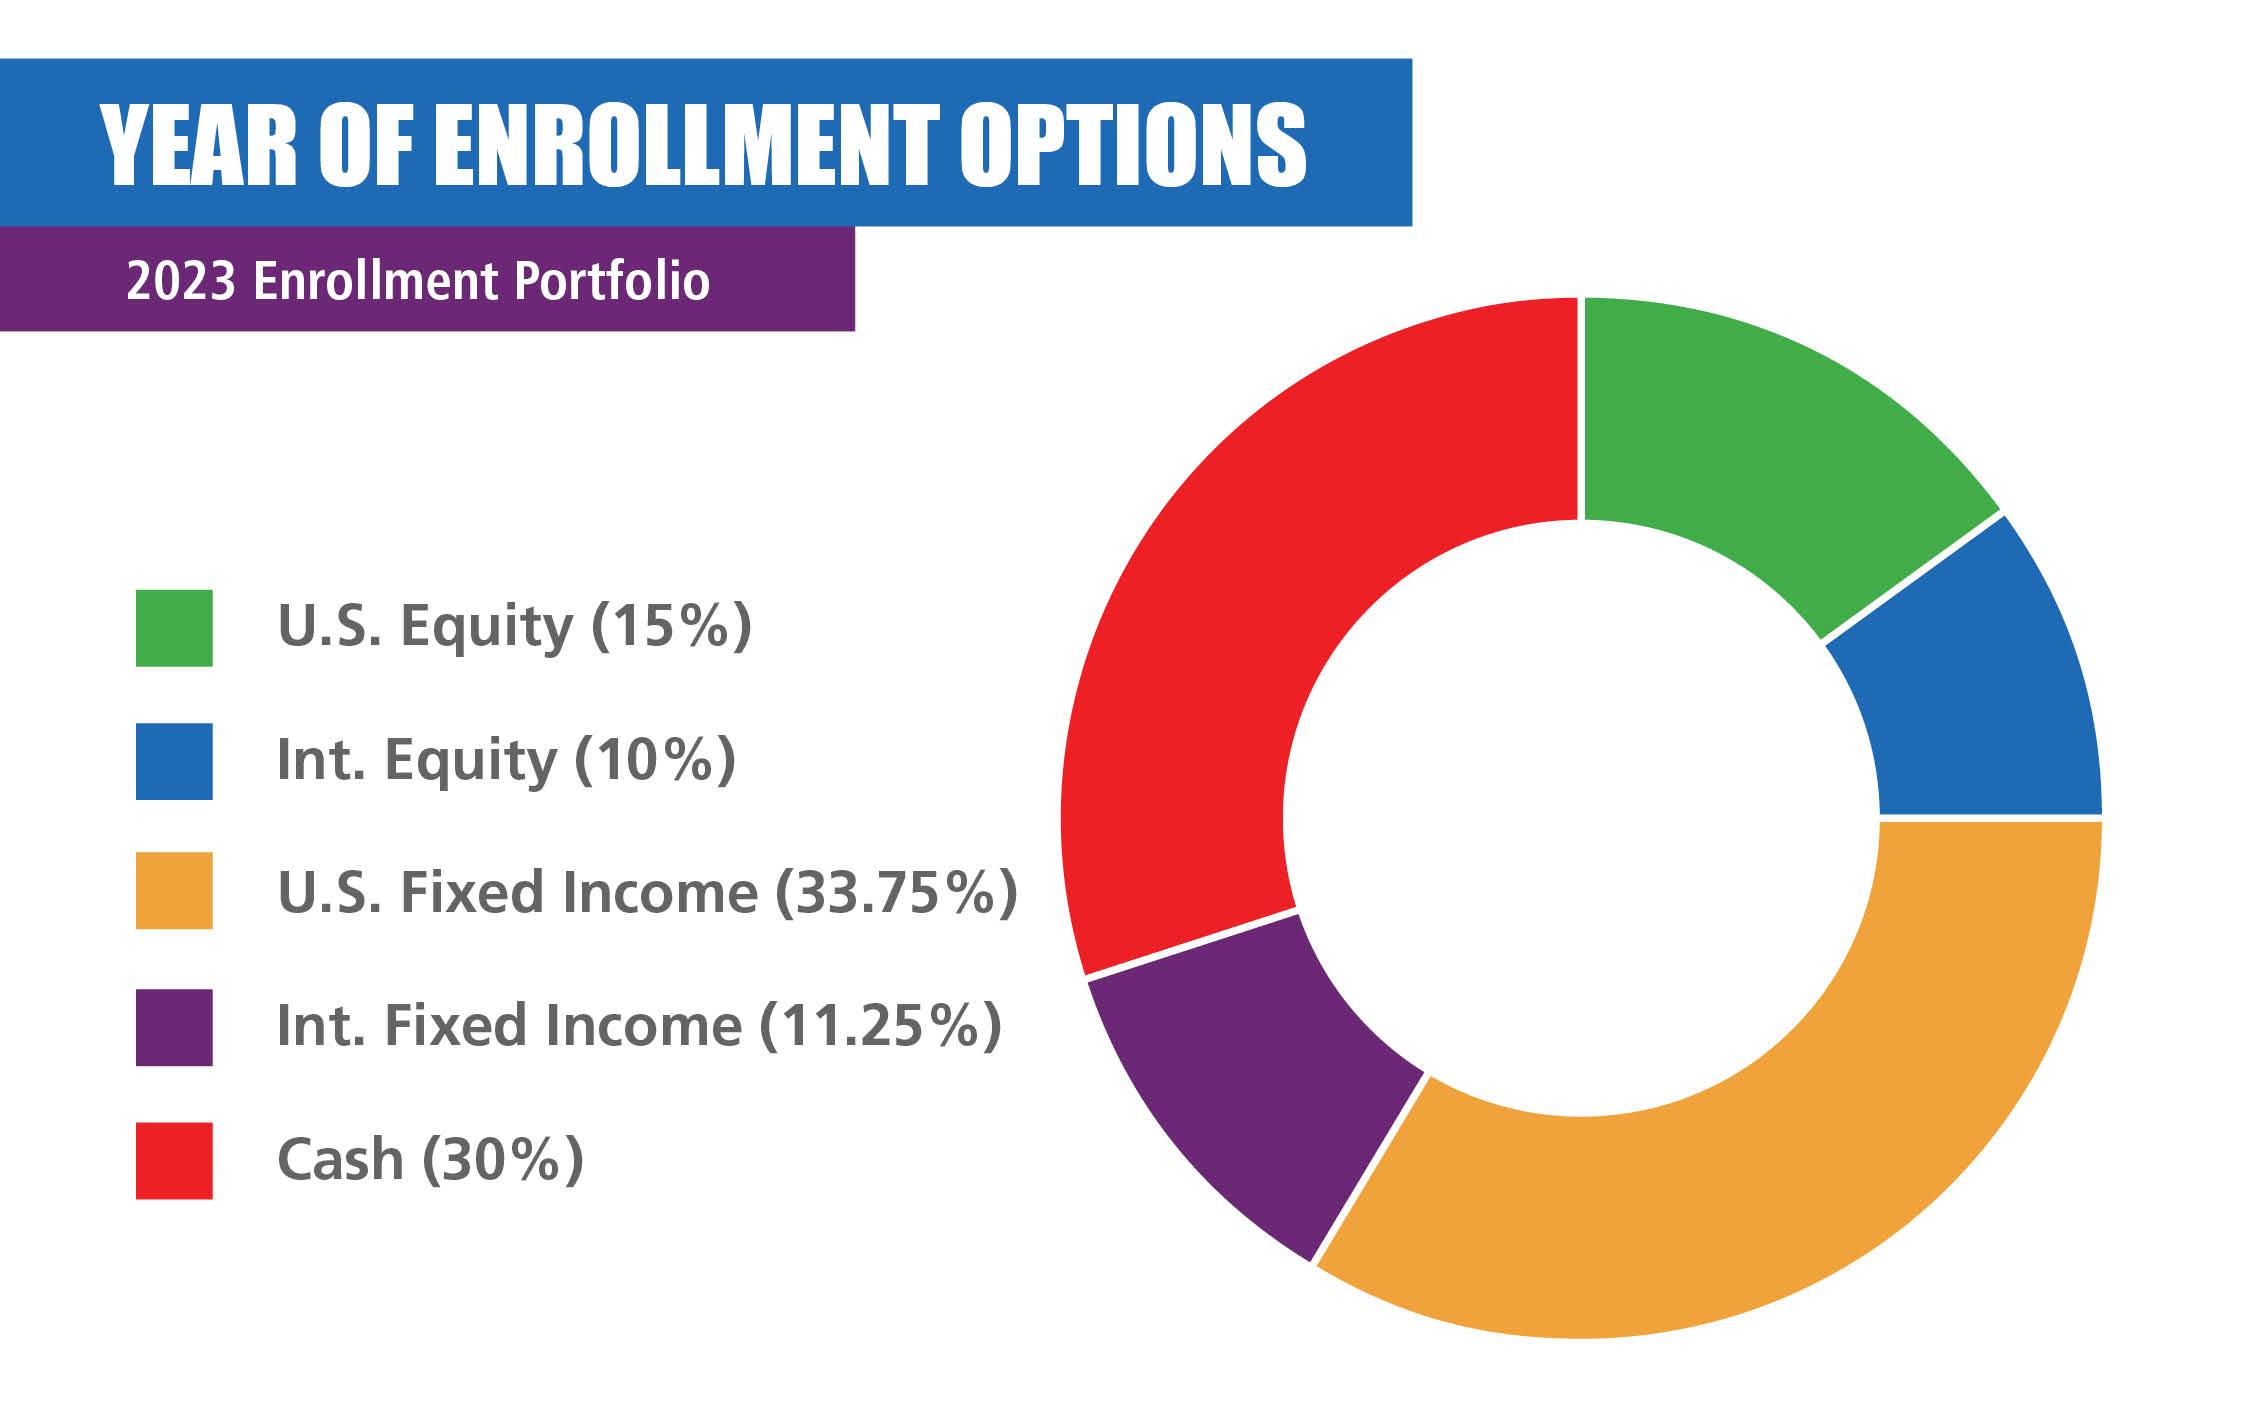 2023 Enrollment Portfolio